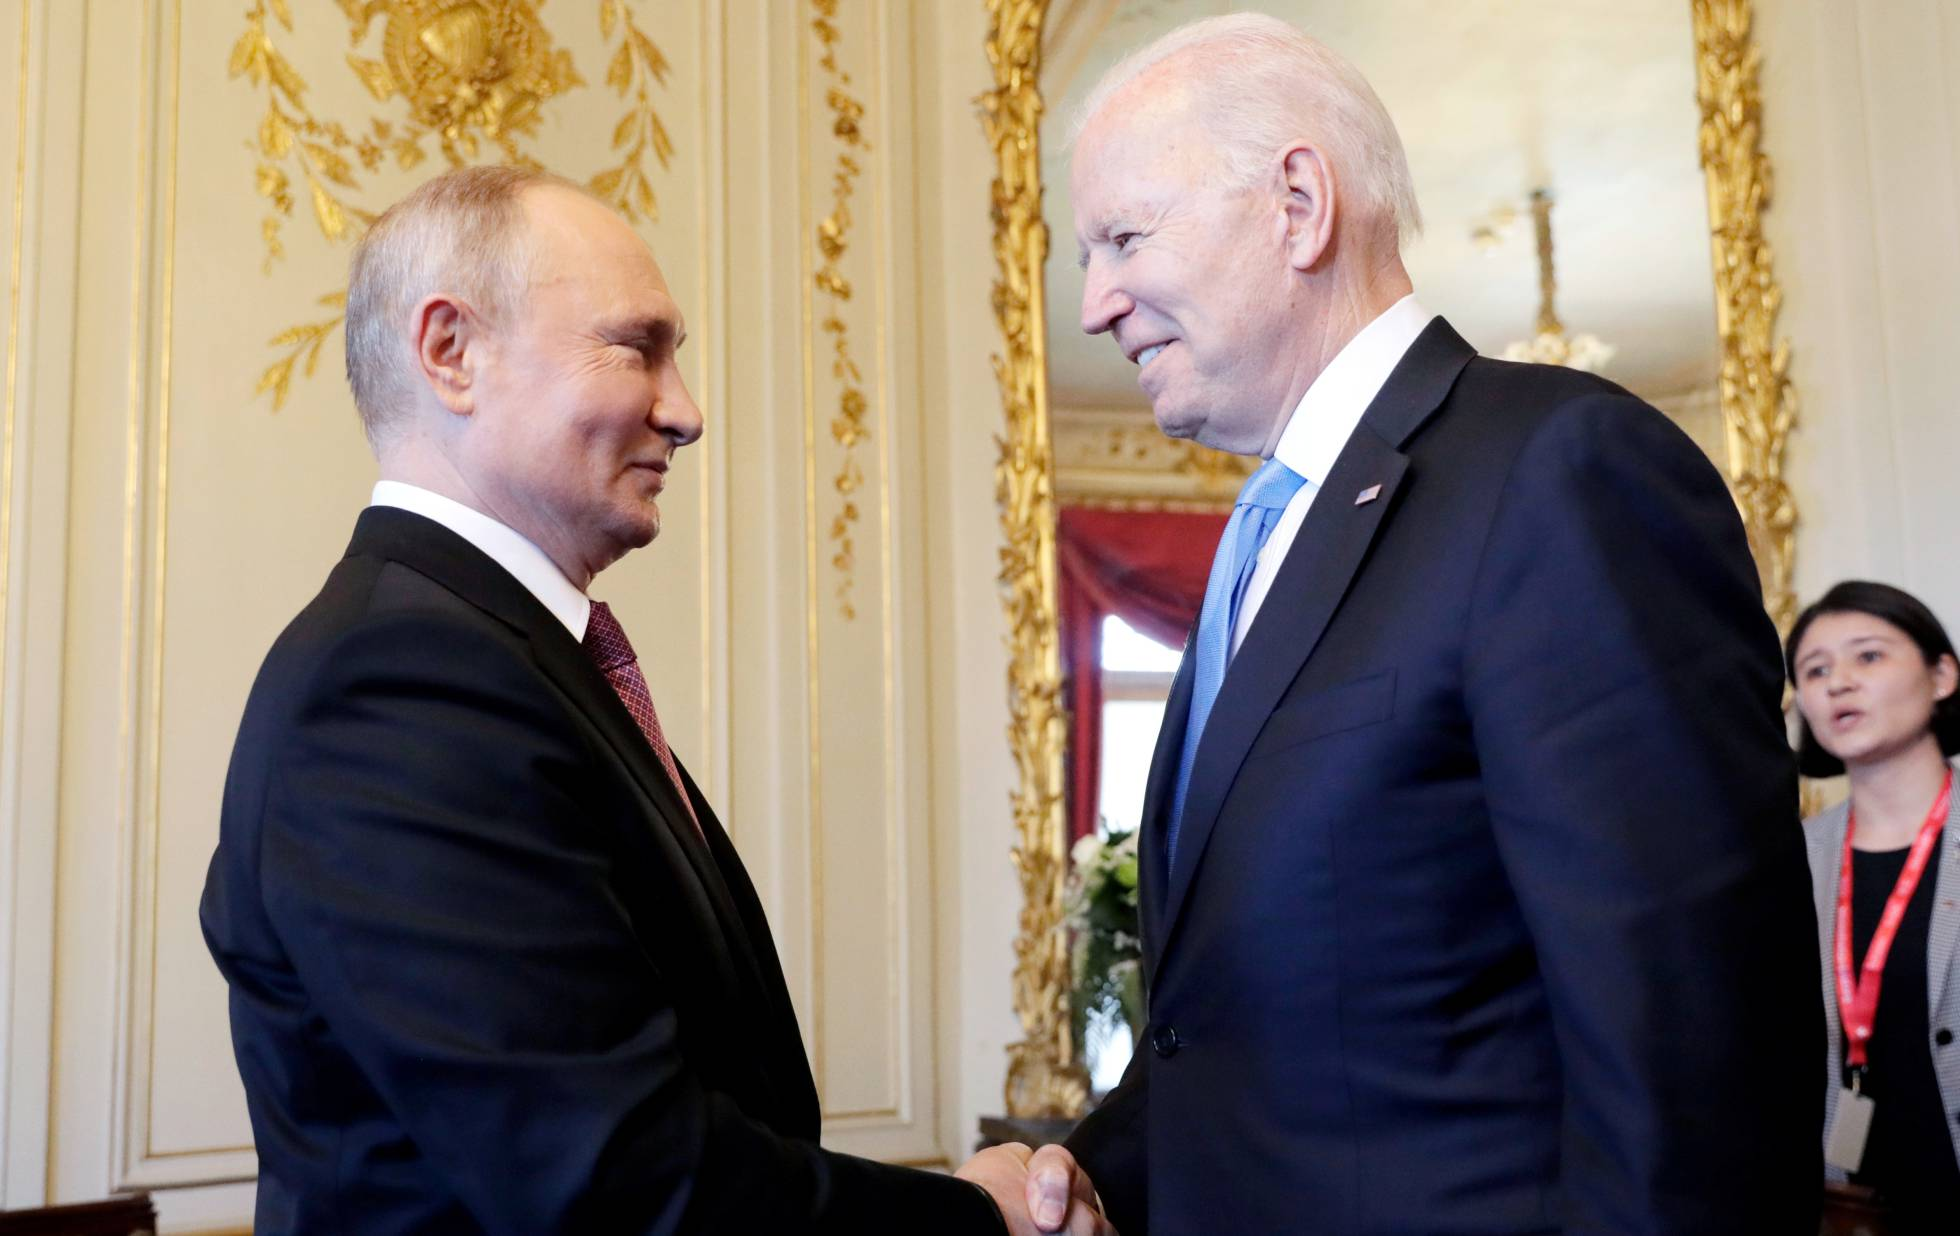 Vladímir Putin (a la izquierda) y Joe Biden se saludan en la Villa La Grange de Génova (Suiza), este miércoles.